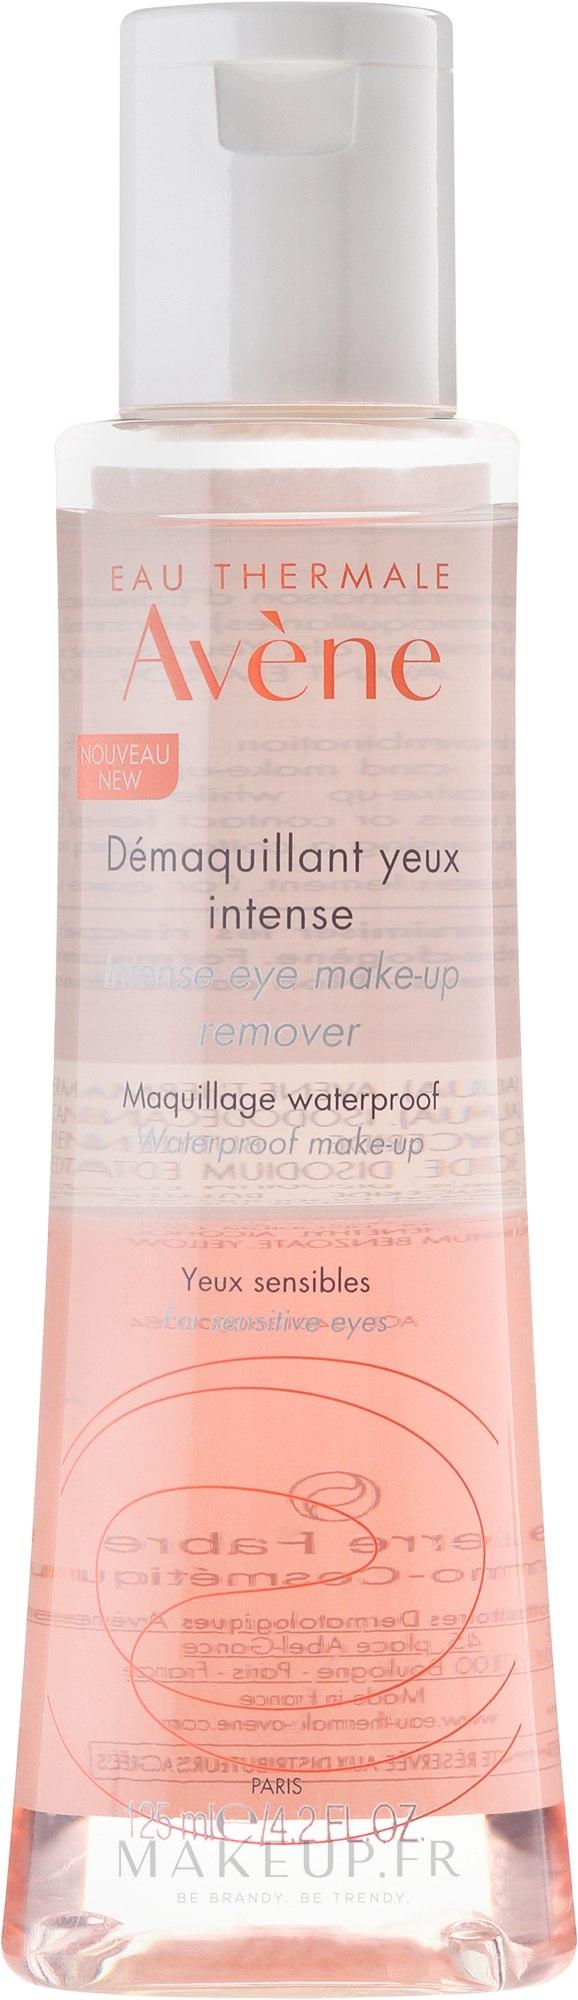 Démaquillant yeux intense - Avene Intense Eye Make-up Remover — Photo 125 ml